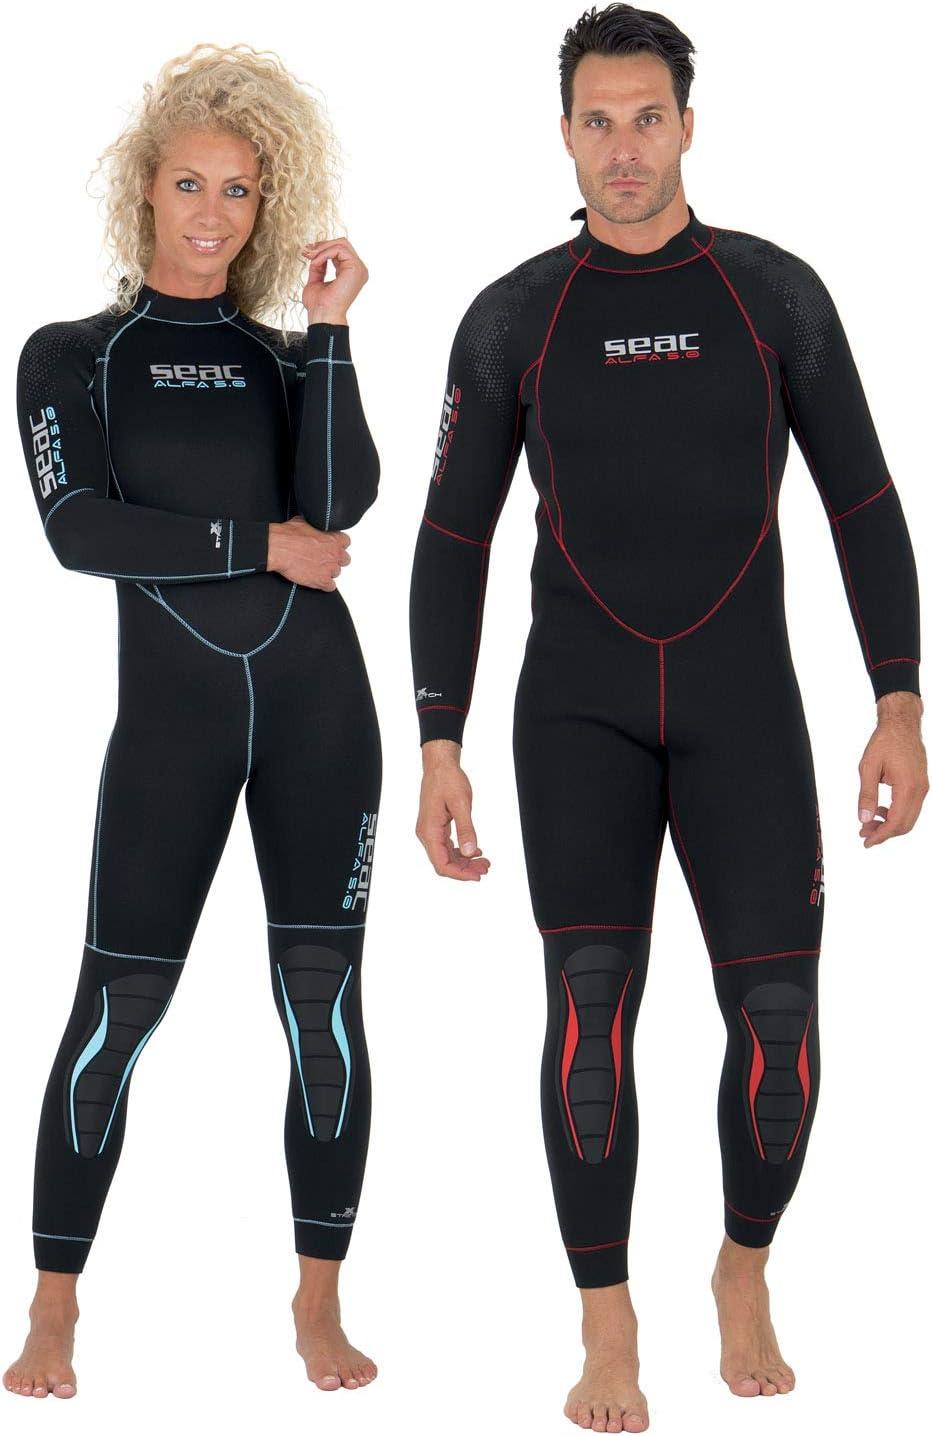 SEAC Mens Alfa 5.0 5 mm Suit for Scuba Diving